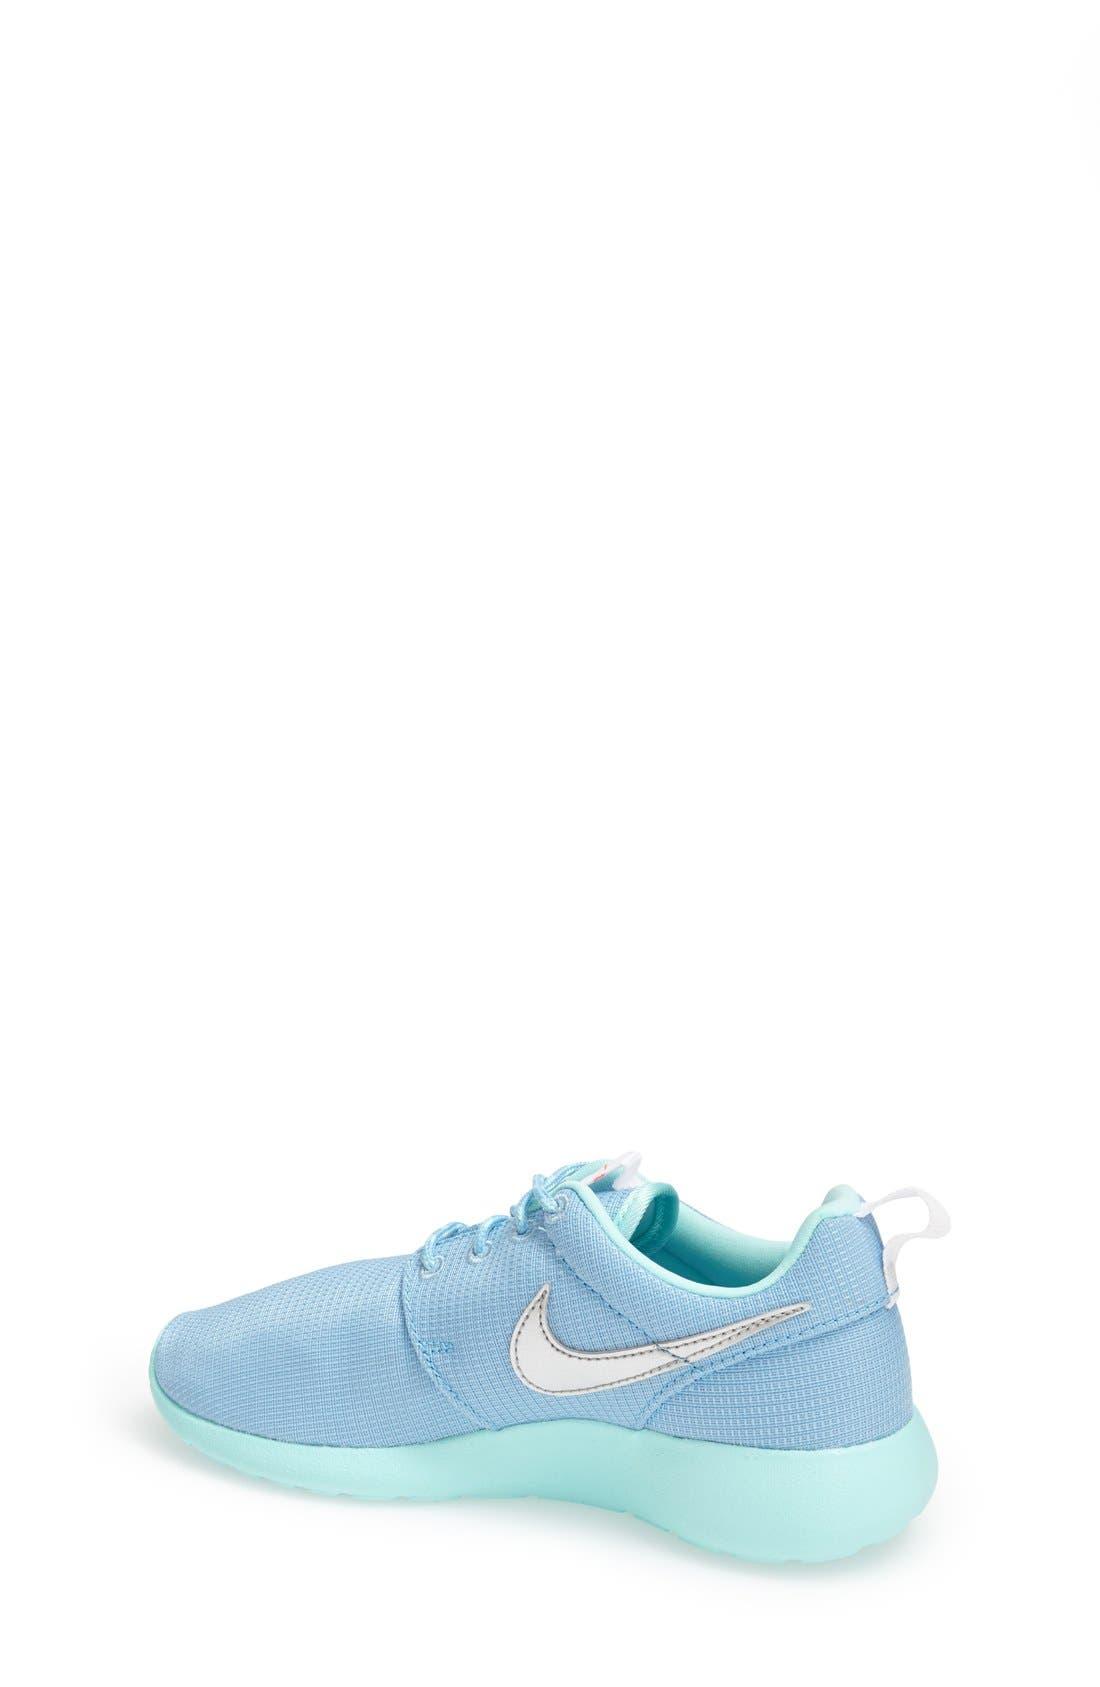 'Roshe Run' Athletic Shoe,                             Alternate thumbnail 131, color,